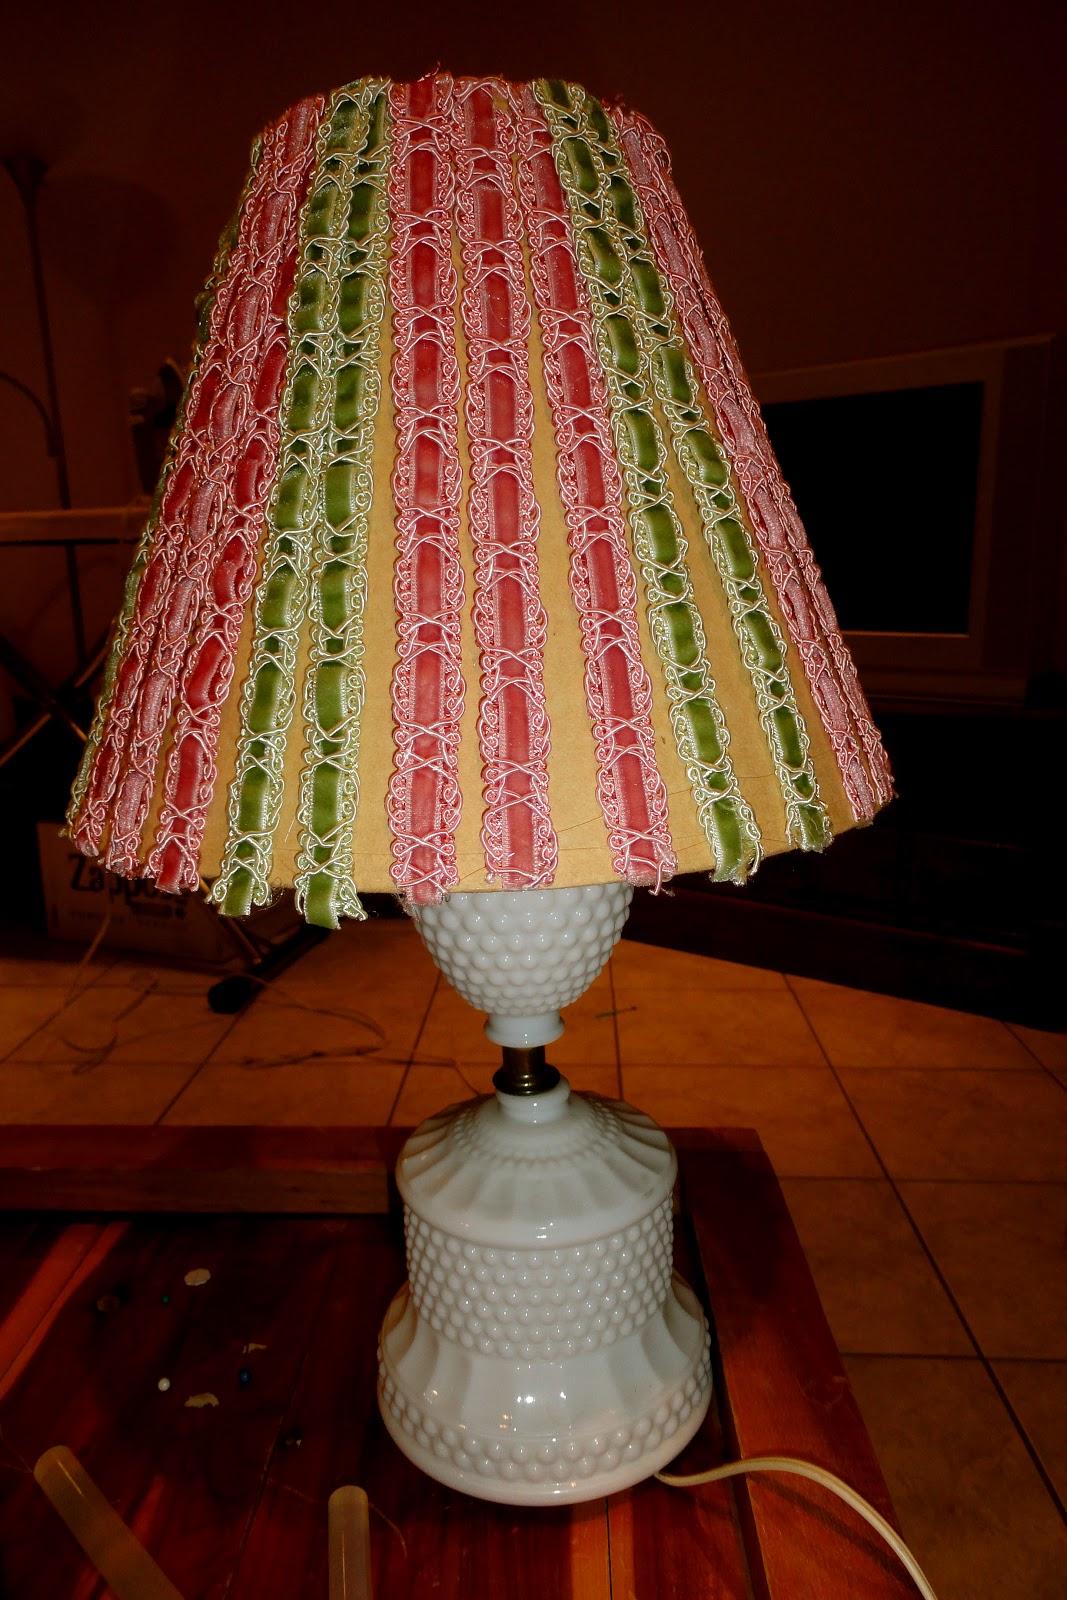 Lamp Shades | Amazon.com | Lighting & Ceiling Fans ...